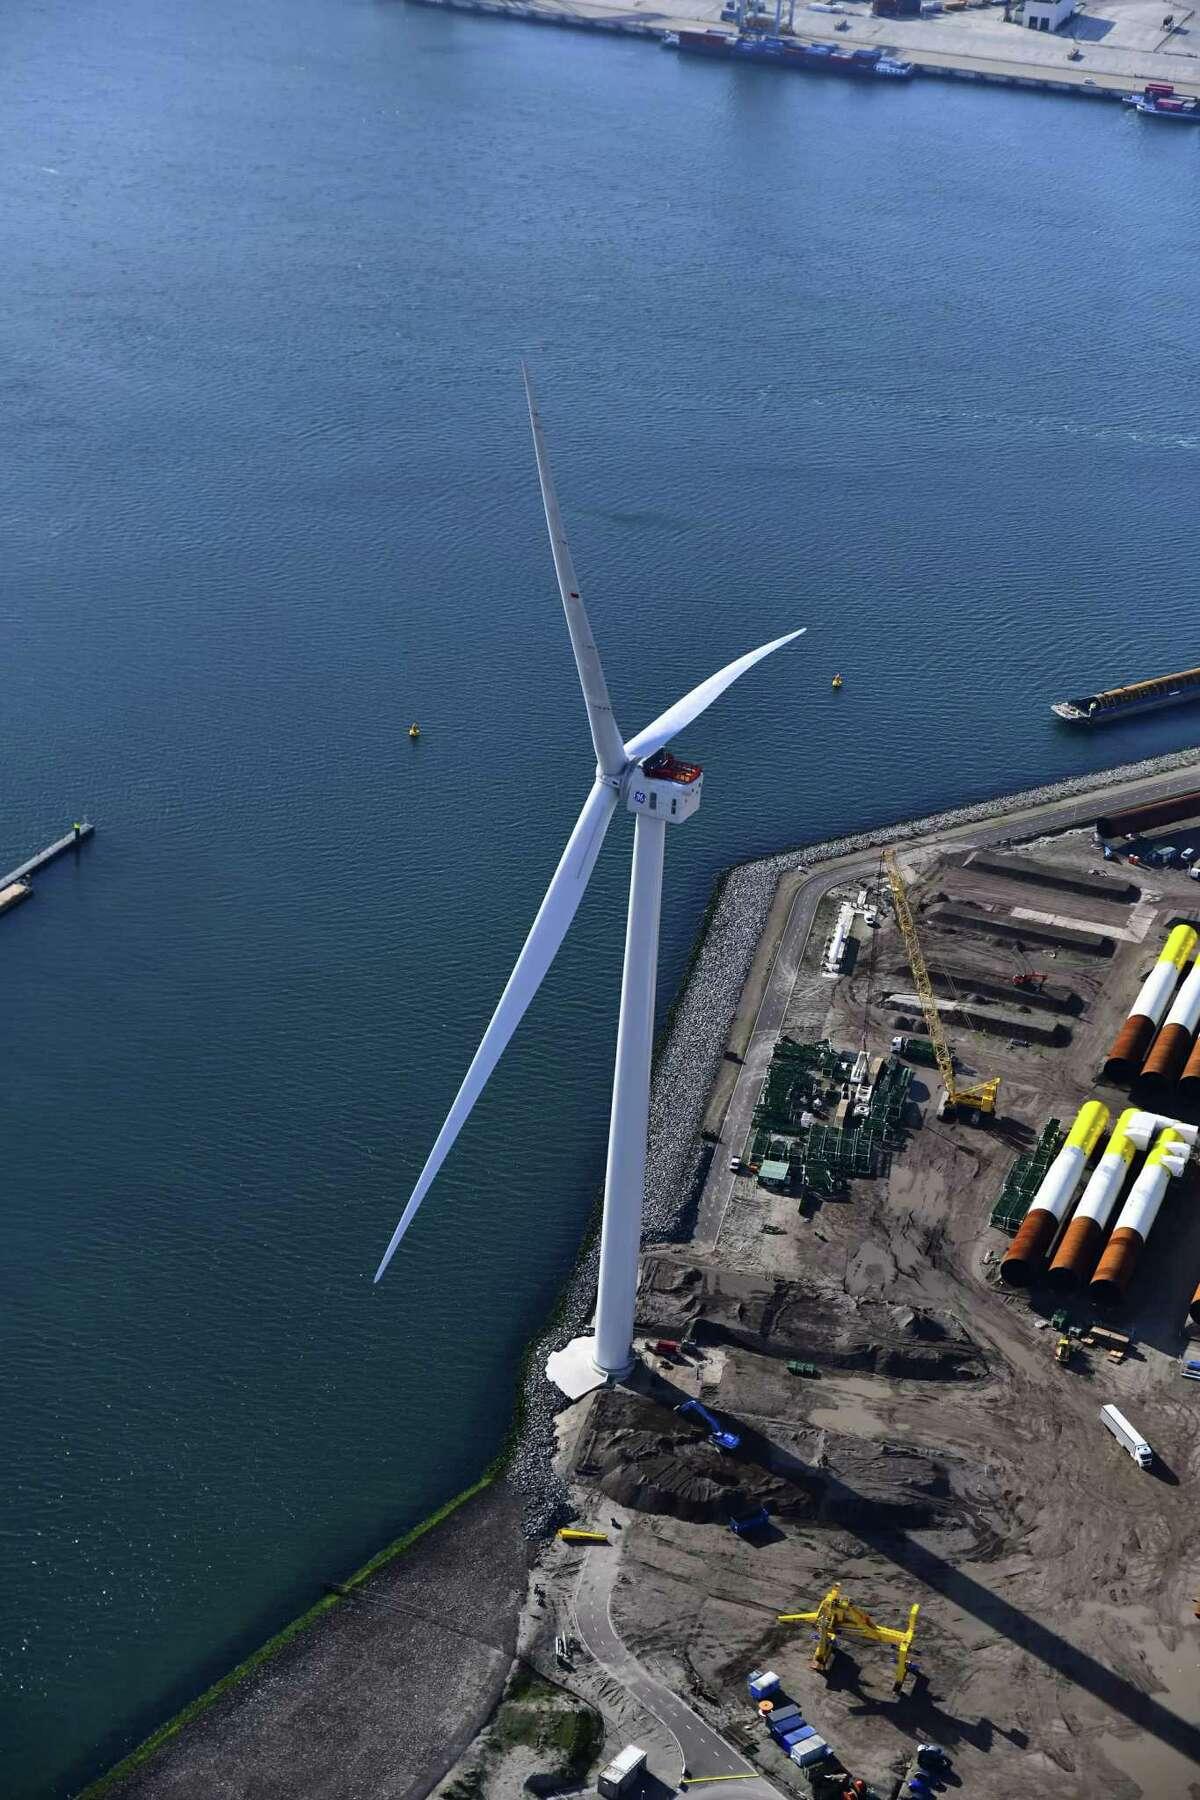 A photo of GE's Haliade-X offshore wind turbine